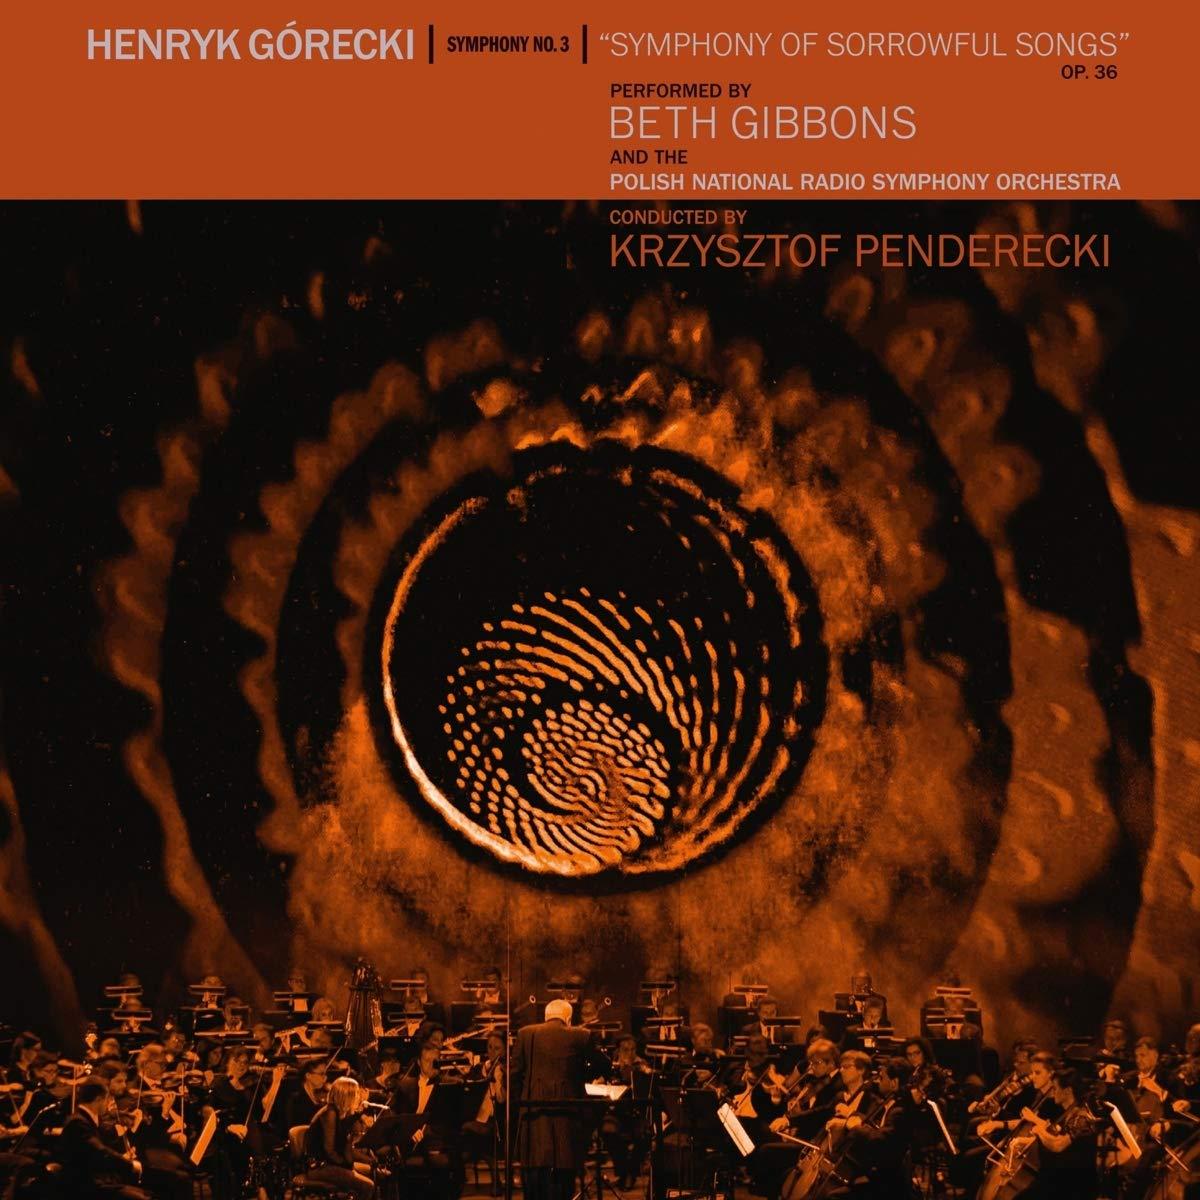 Gorecki 3rd Symphony Of Sorrowful Songs